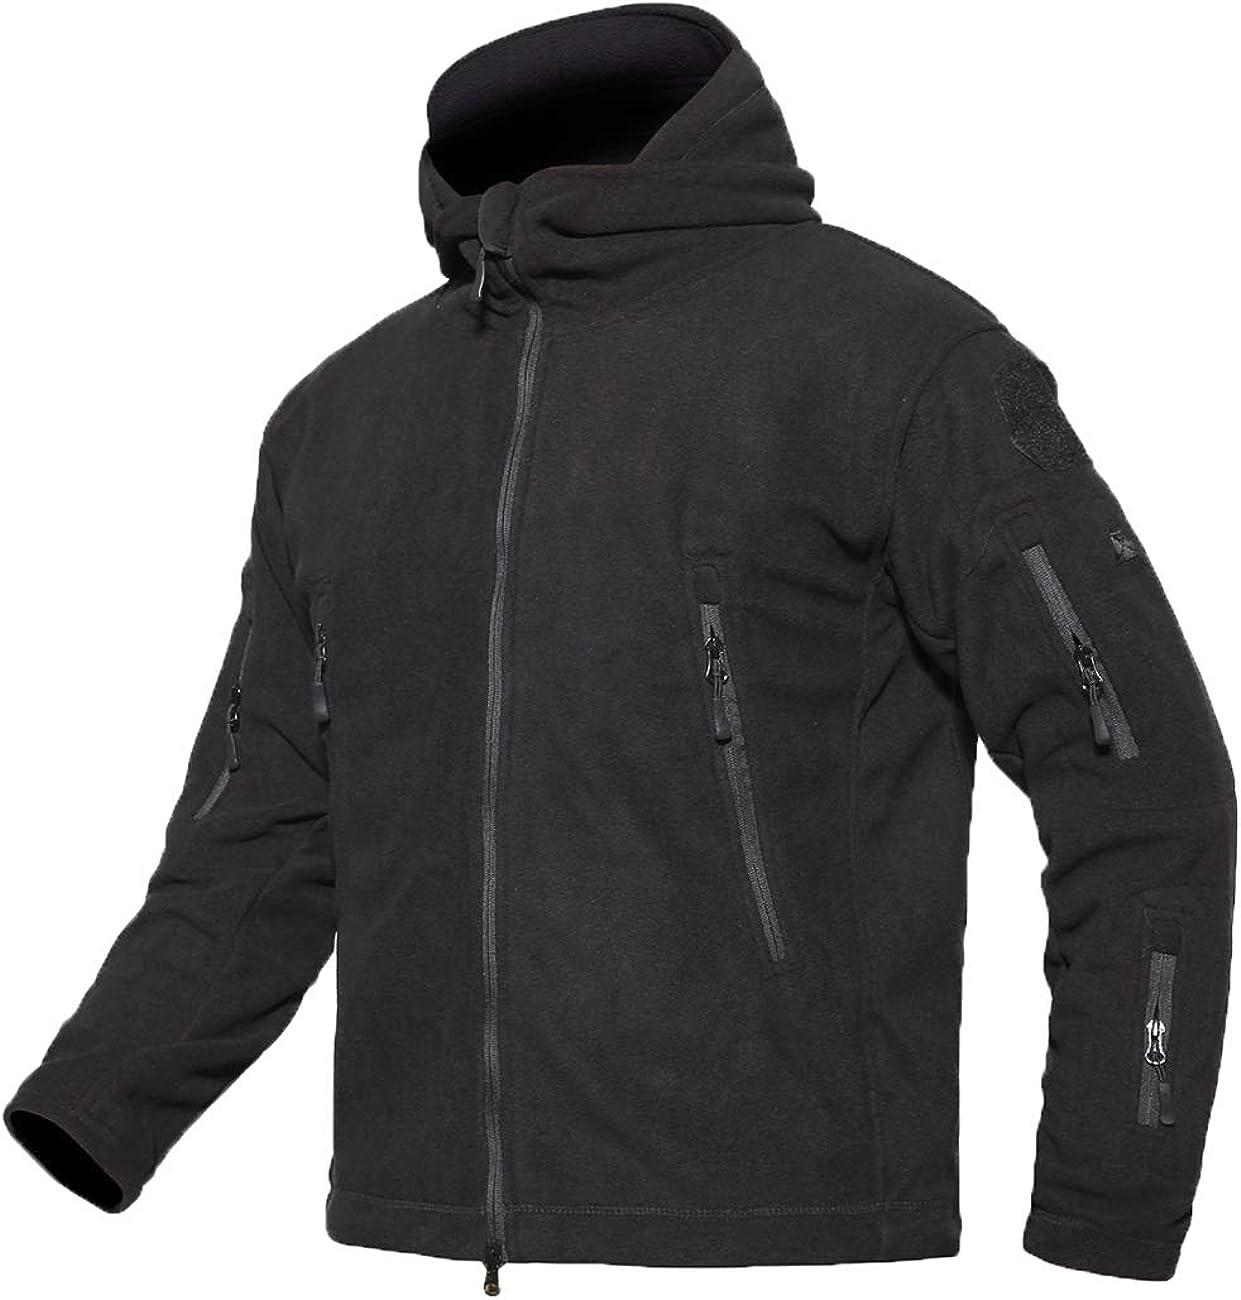 YFNT Men's Warm Military Tactical Fleece Hooded Jacket (X-Large, Black)